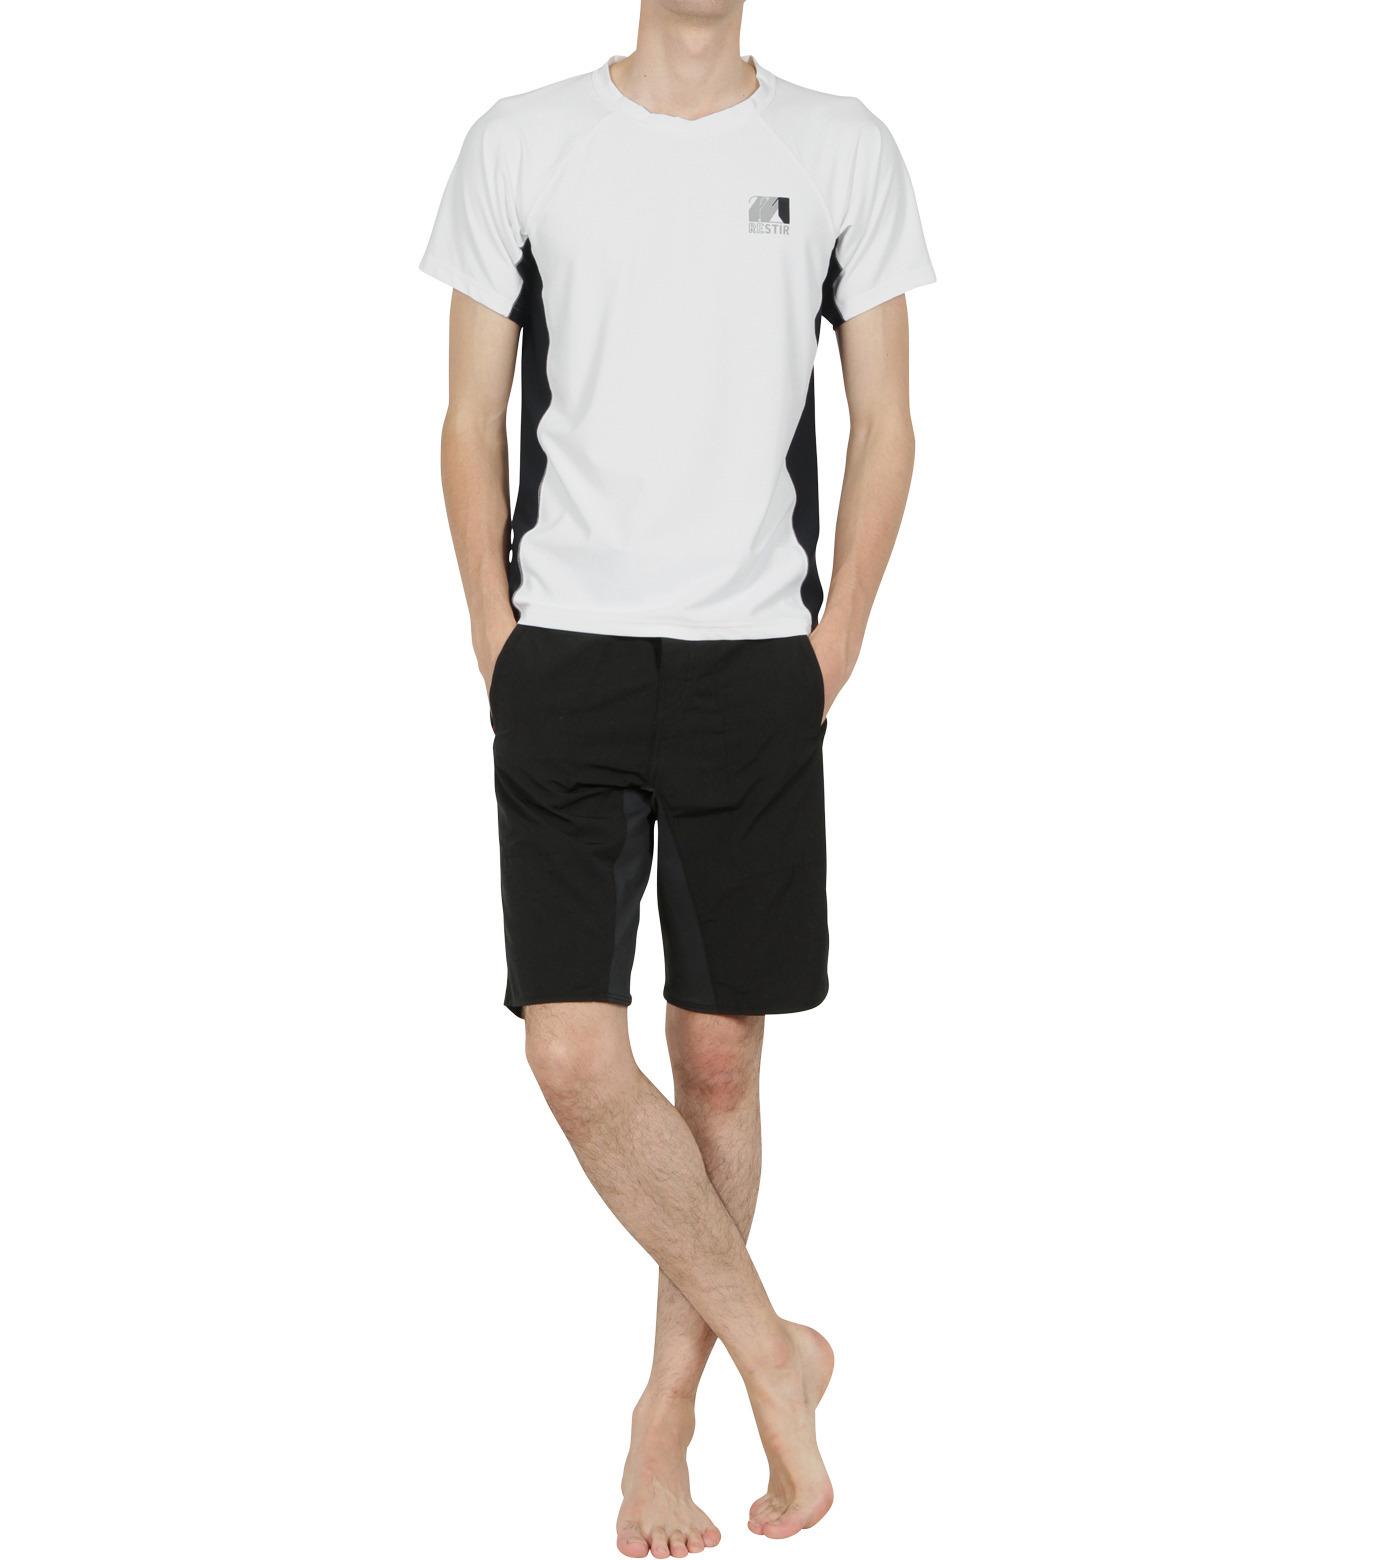 TWO TWO ONE(トゥートゥーワン)のSurf shorts long-BLACK(SWIMWEAR/SWIMWEAR)-15N948002-13 拡大詳細画像3